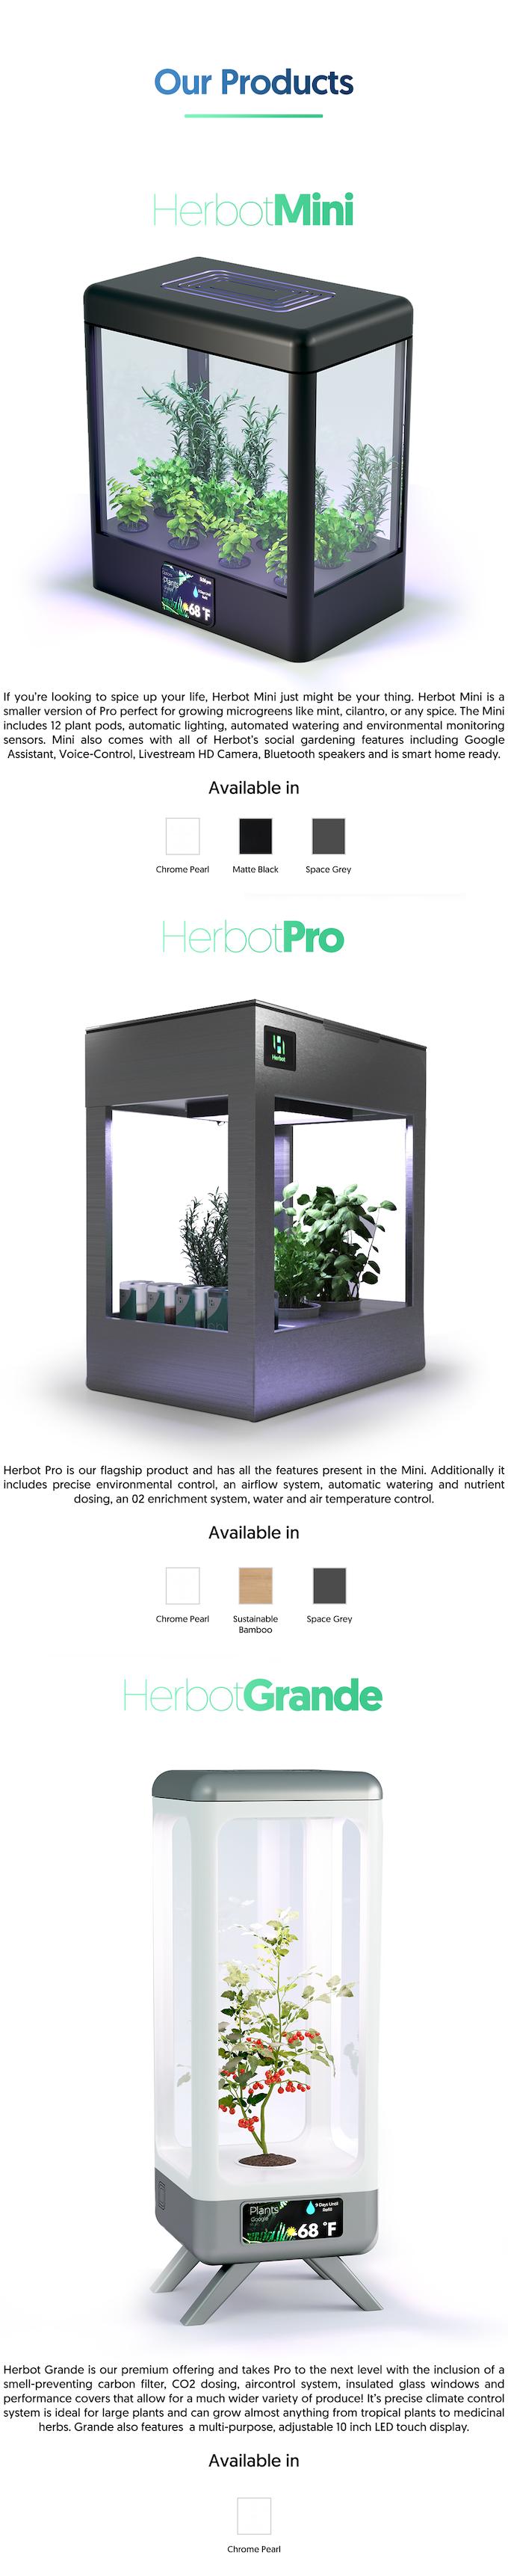 Herbot: Automatic Indoor Gardening Robot by farm 4 0 — Kickstarter